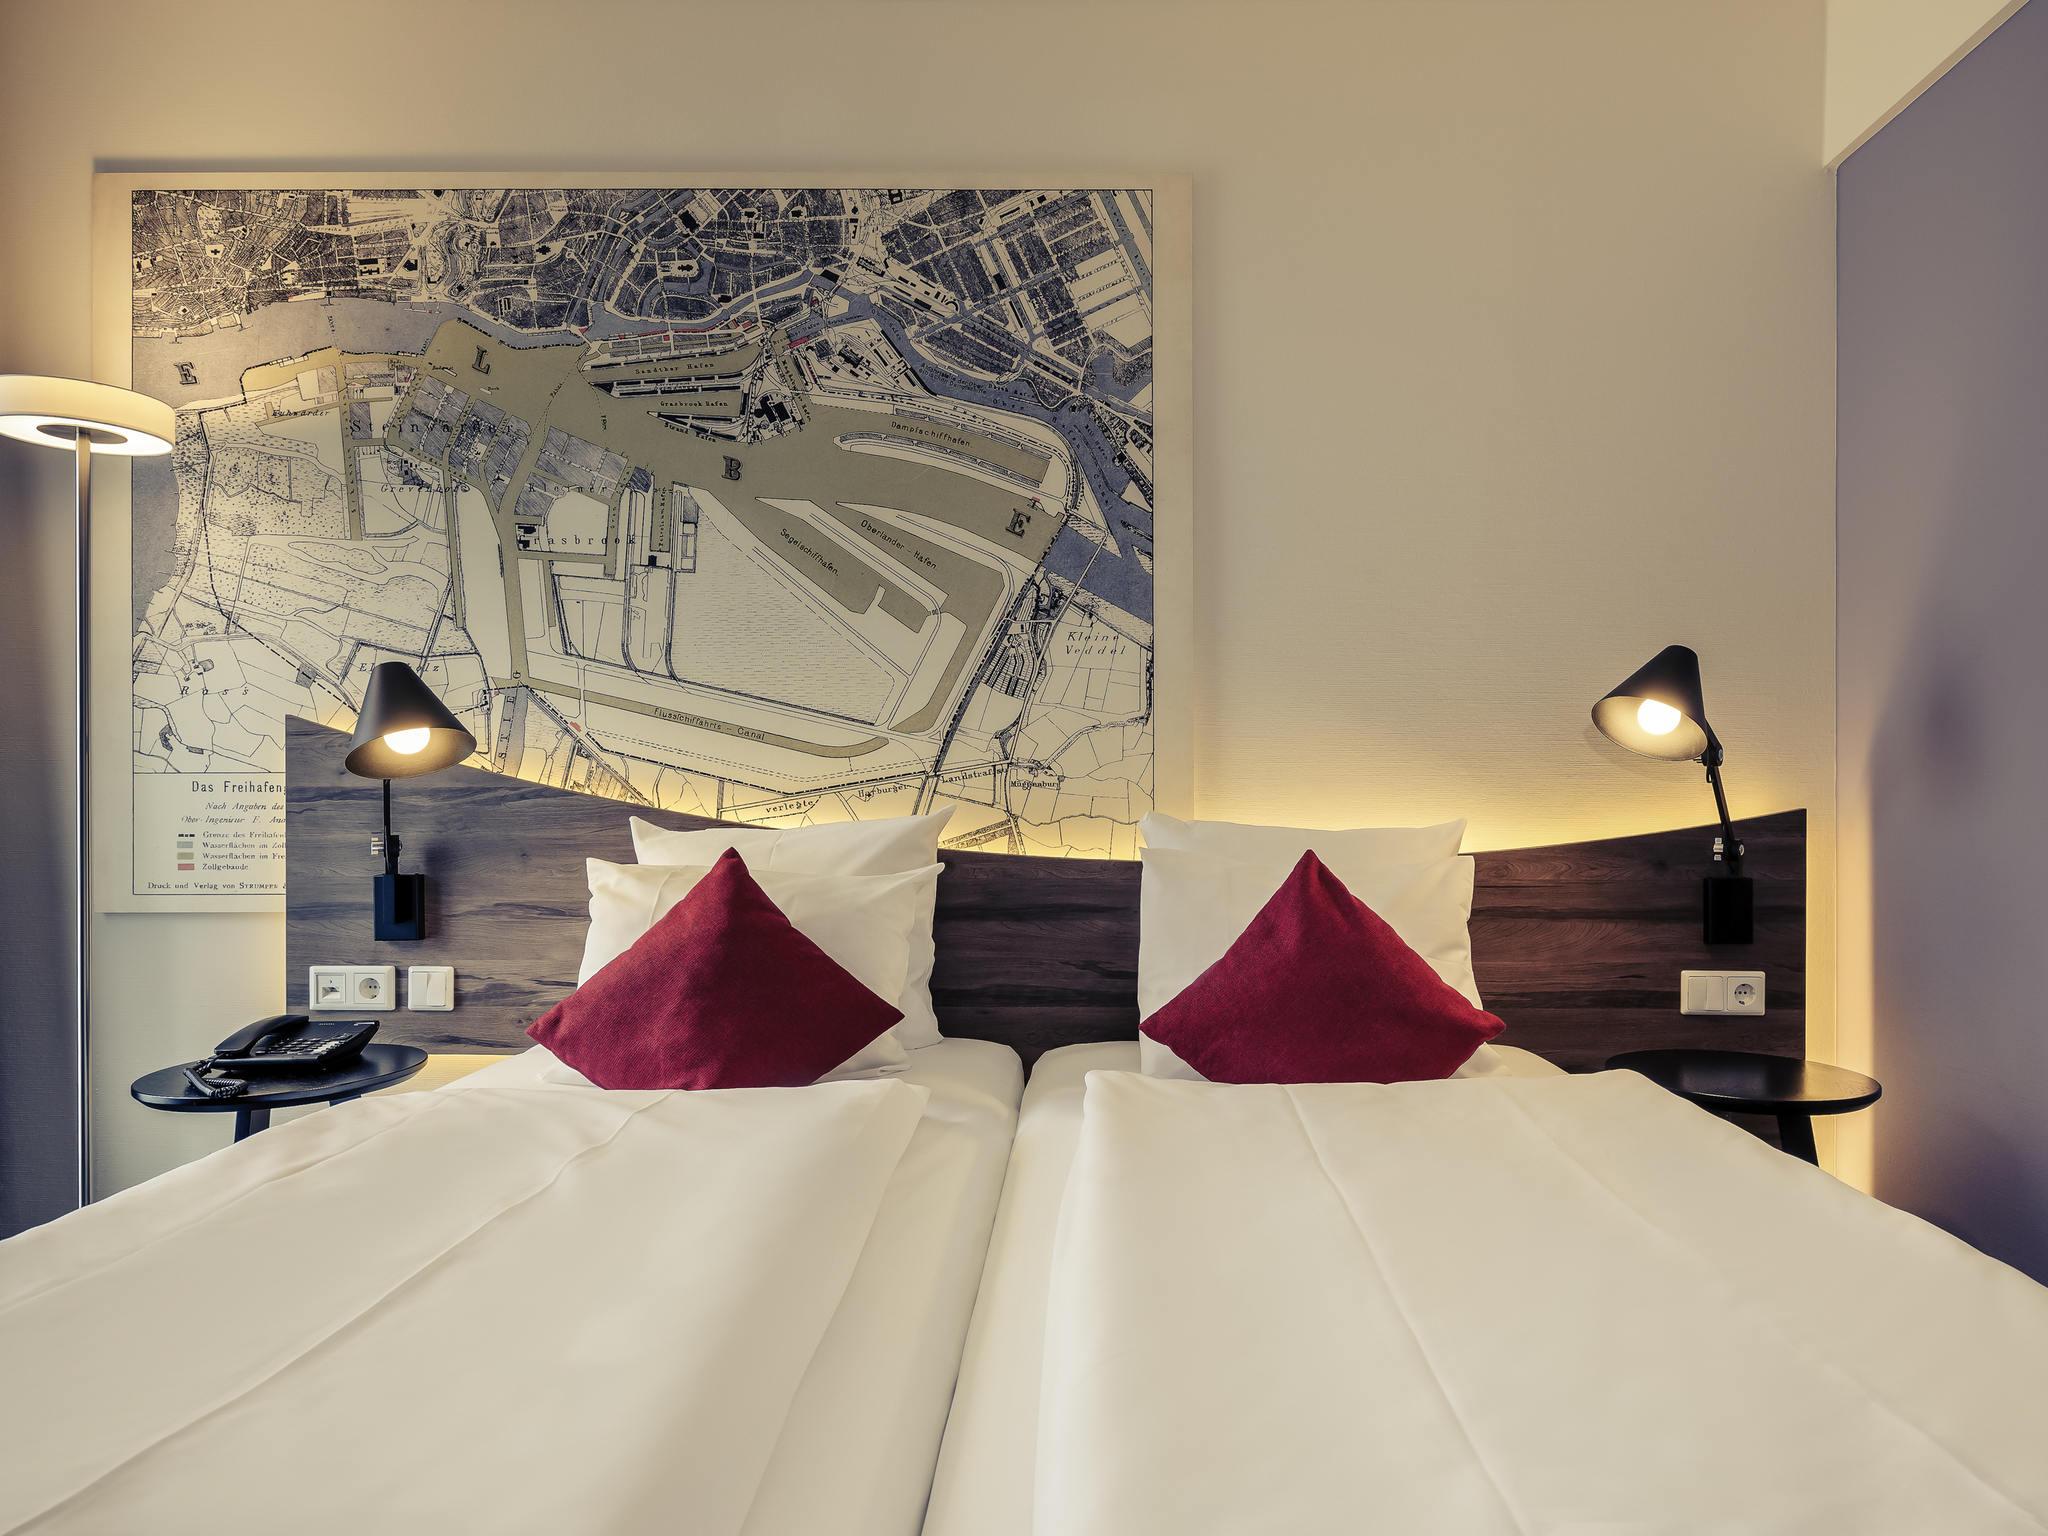 4 Sterne Hotel Hamburg Mitte Mercure